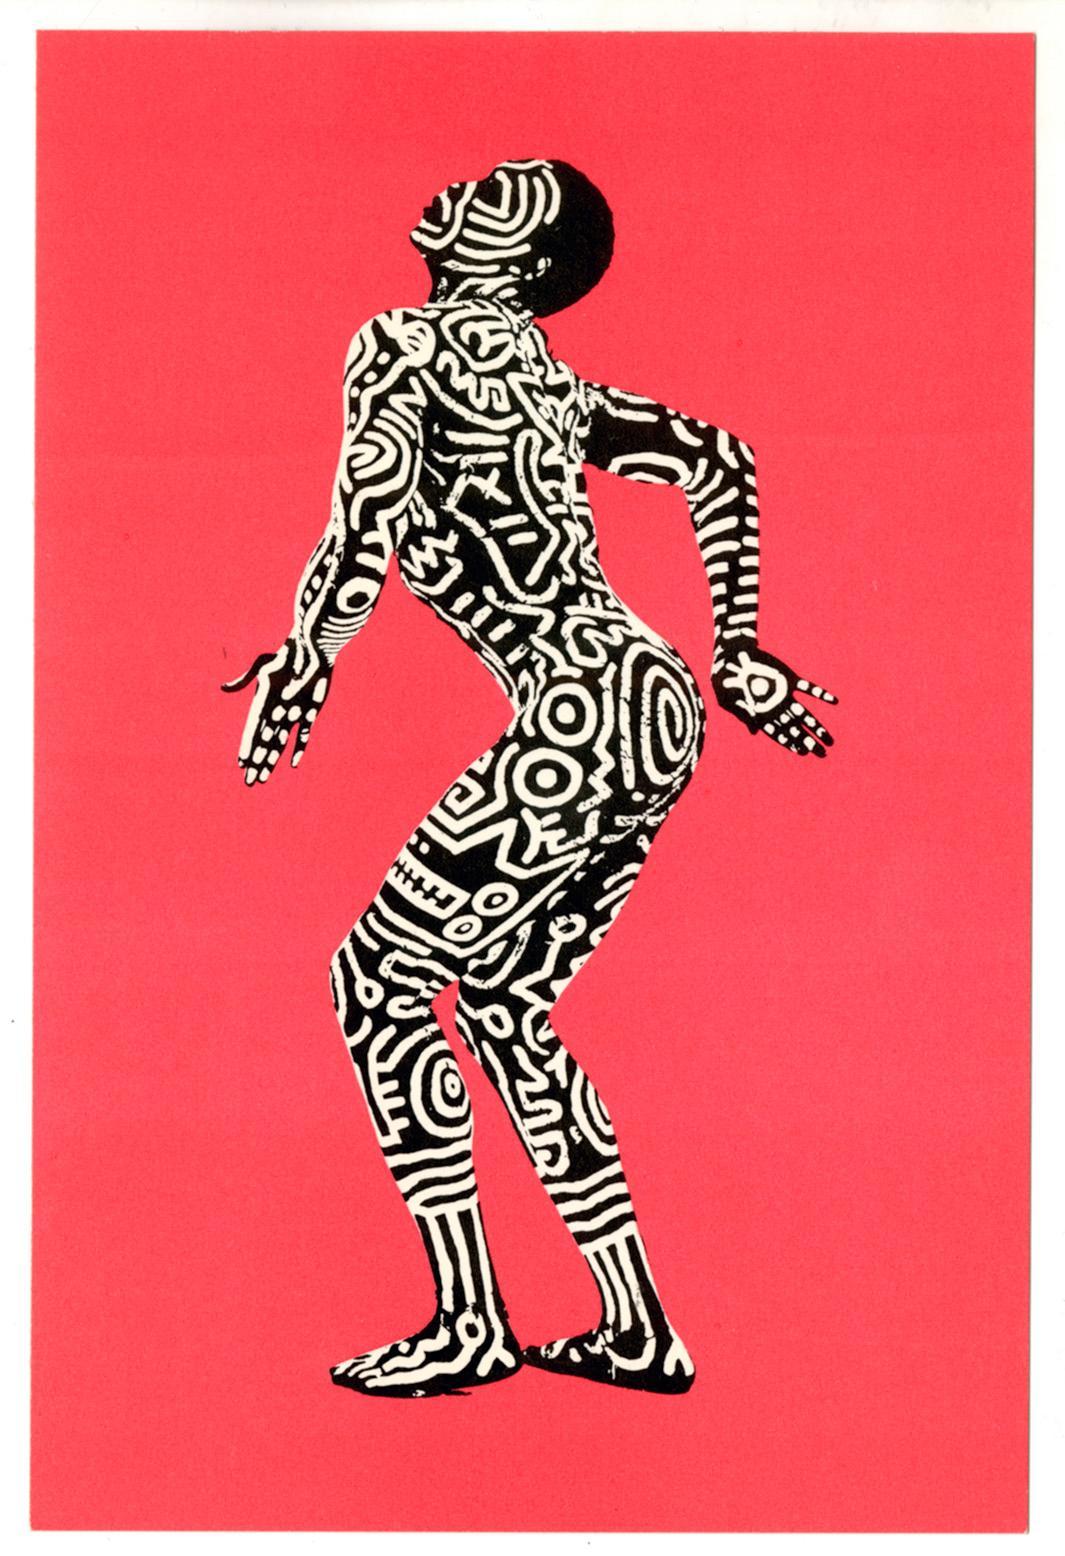 Keith Haring Into 84 (Keith Haring Tony Shafrazi announcement)